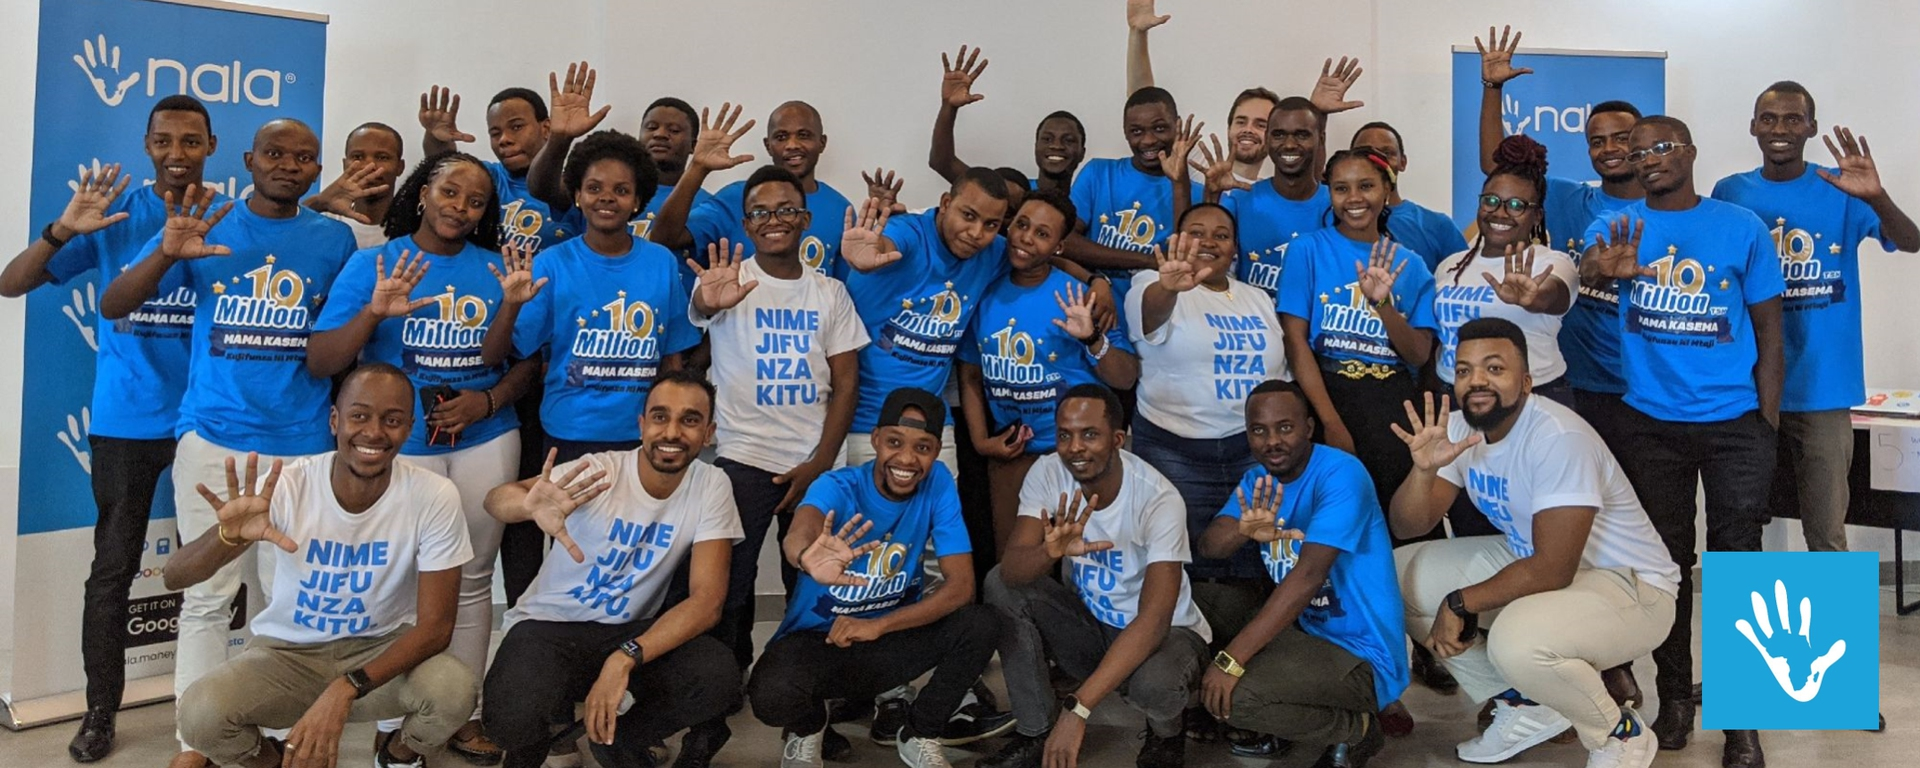 Nala - Marketing & Community Lead Movemeback African opportunity cover image